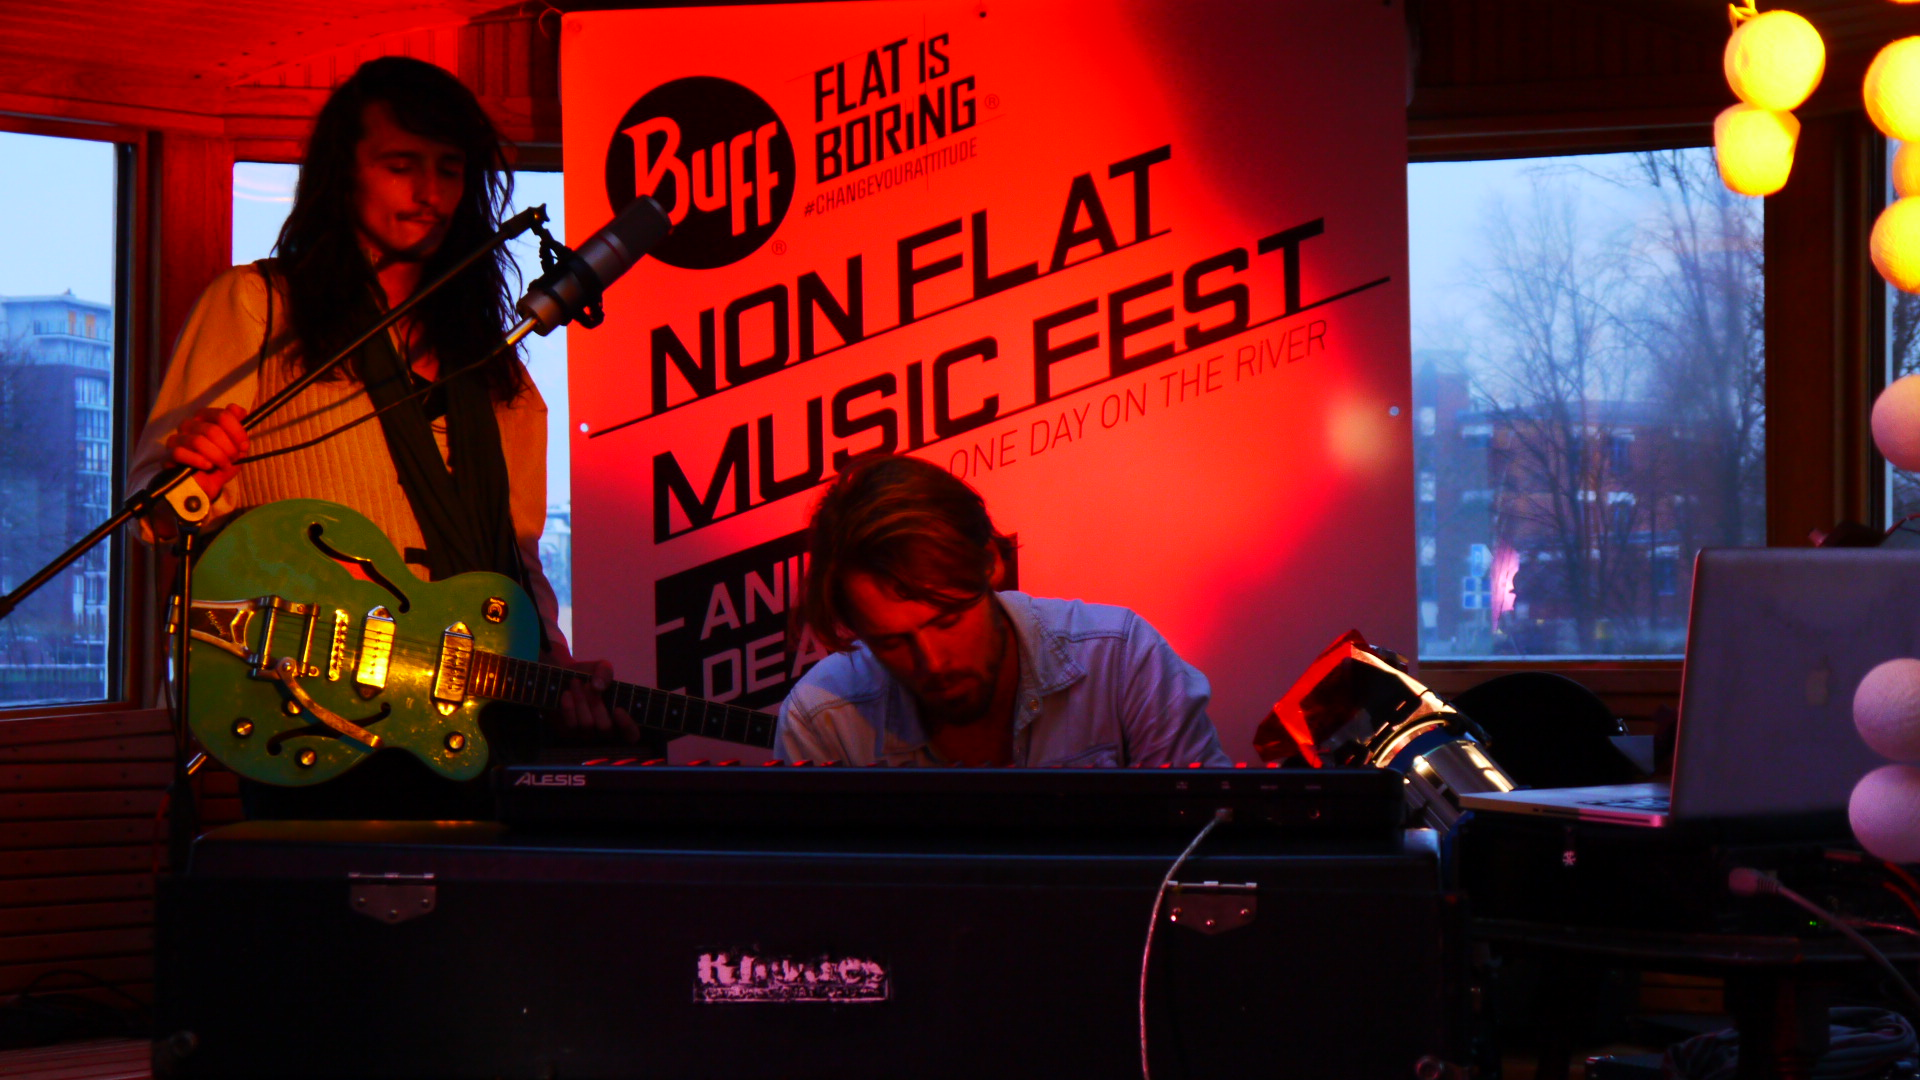 Non flat Music festival